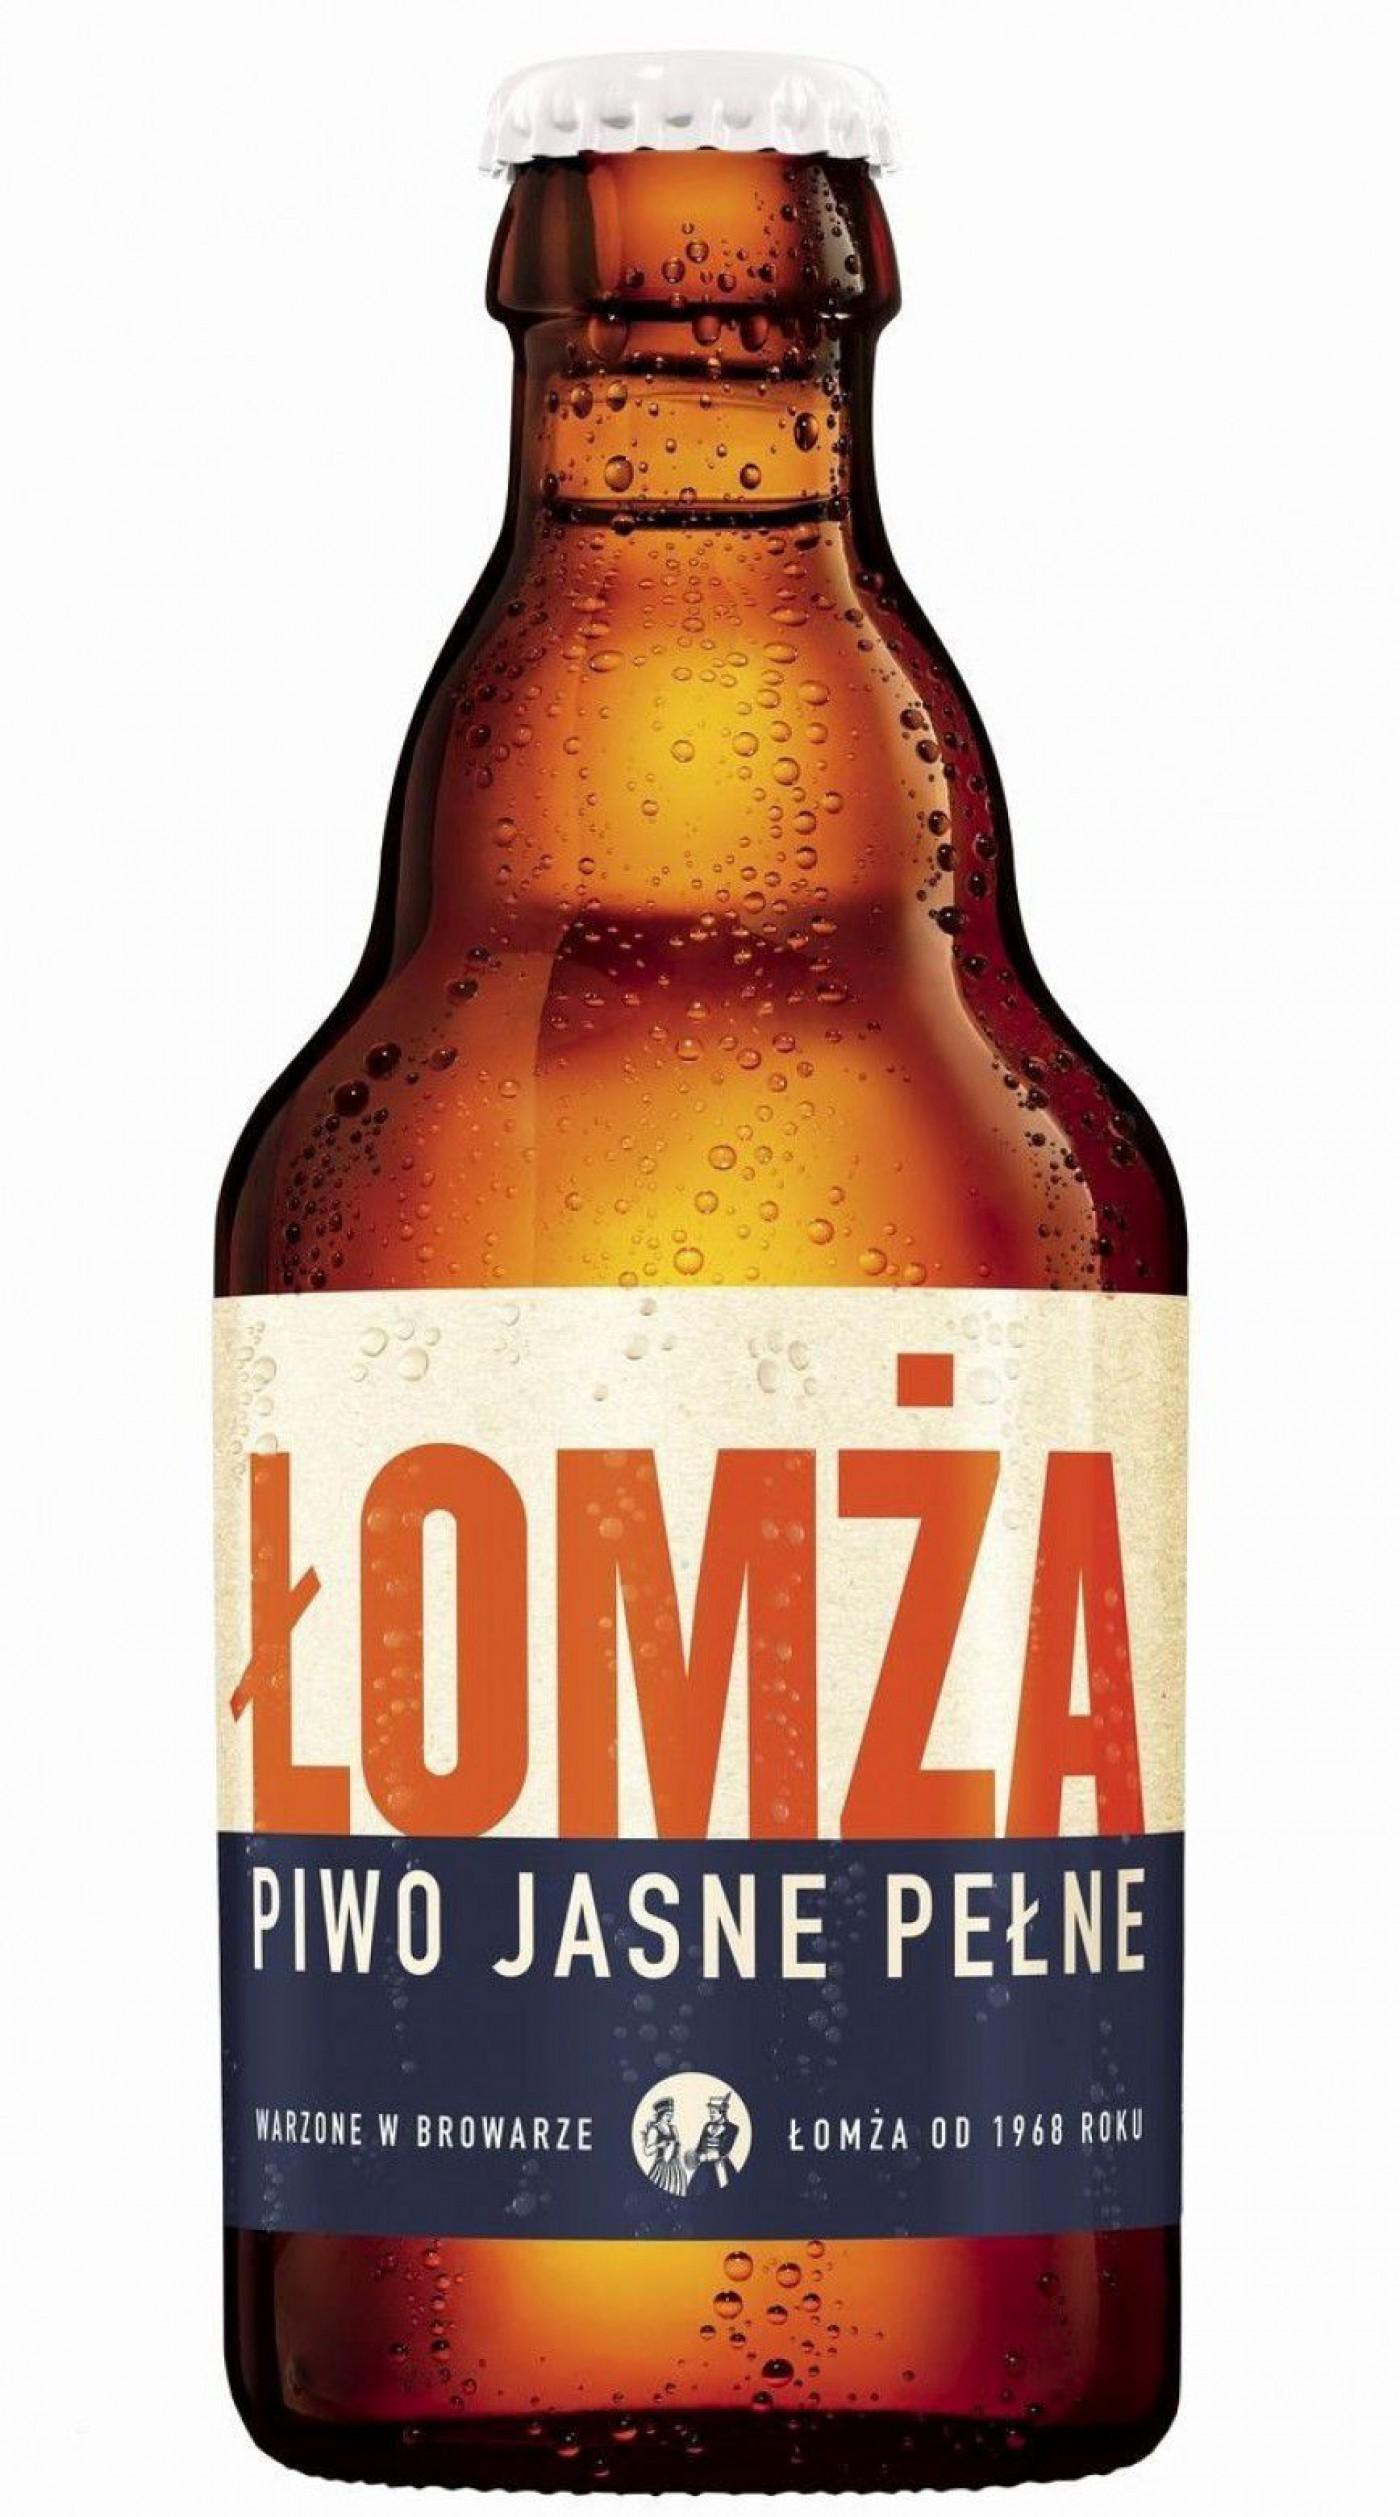 000 Unusual Microsoft Word Beer Label Template Inspiration  Bottle1400